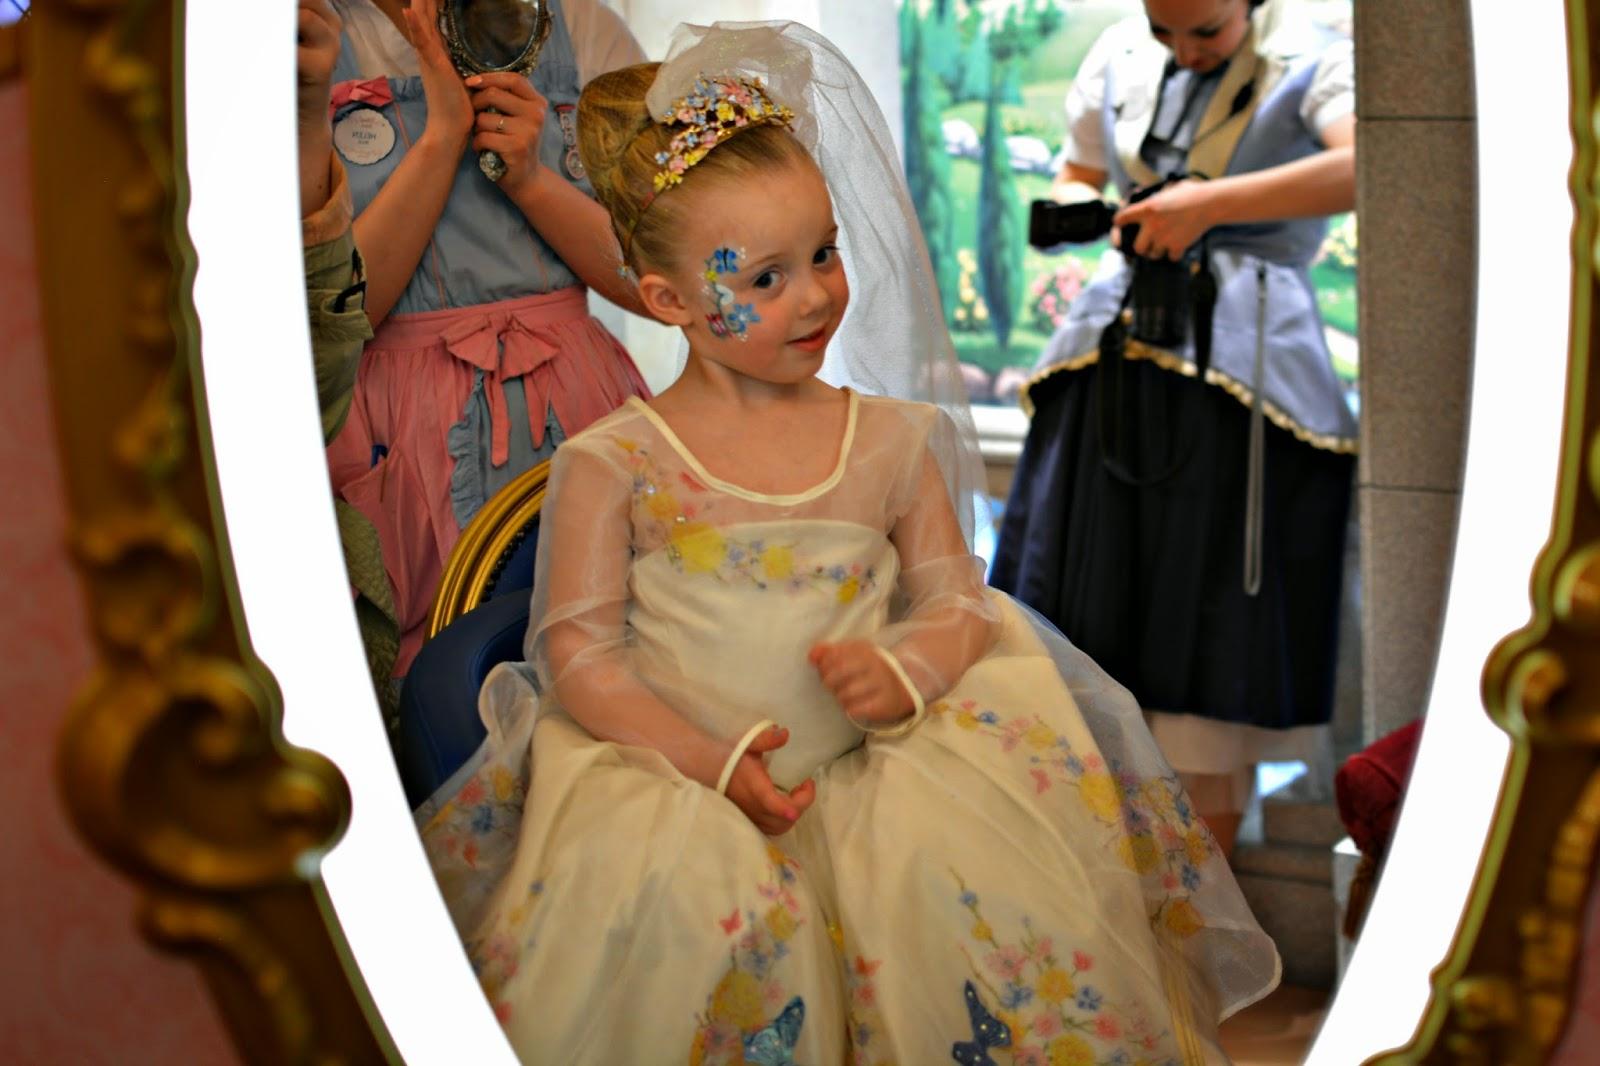 Disney Bibbidi Bobbidi Boutique Cinderella Experience